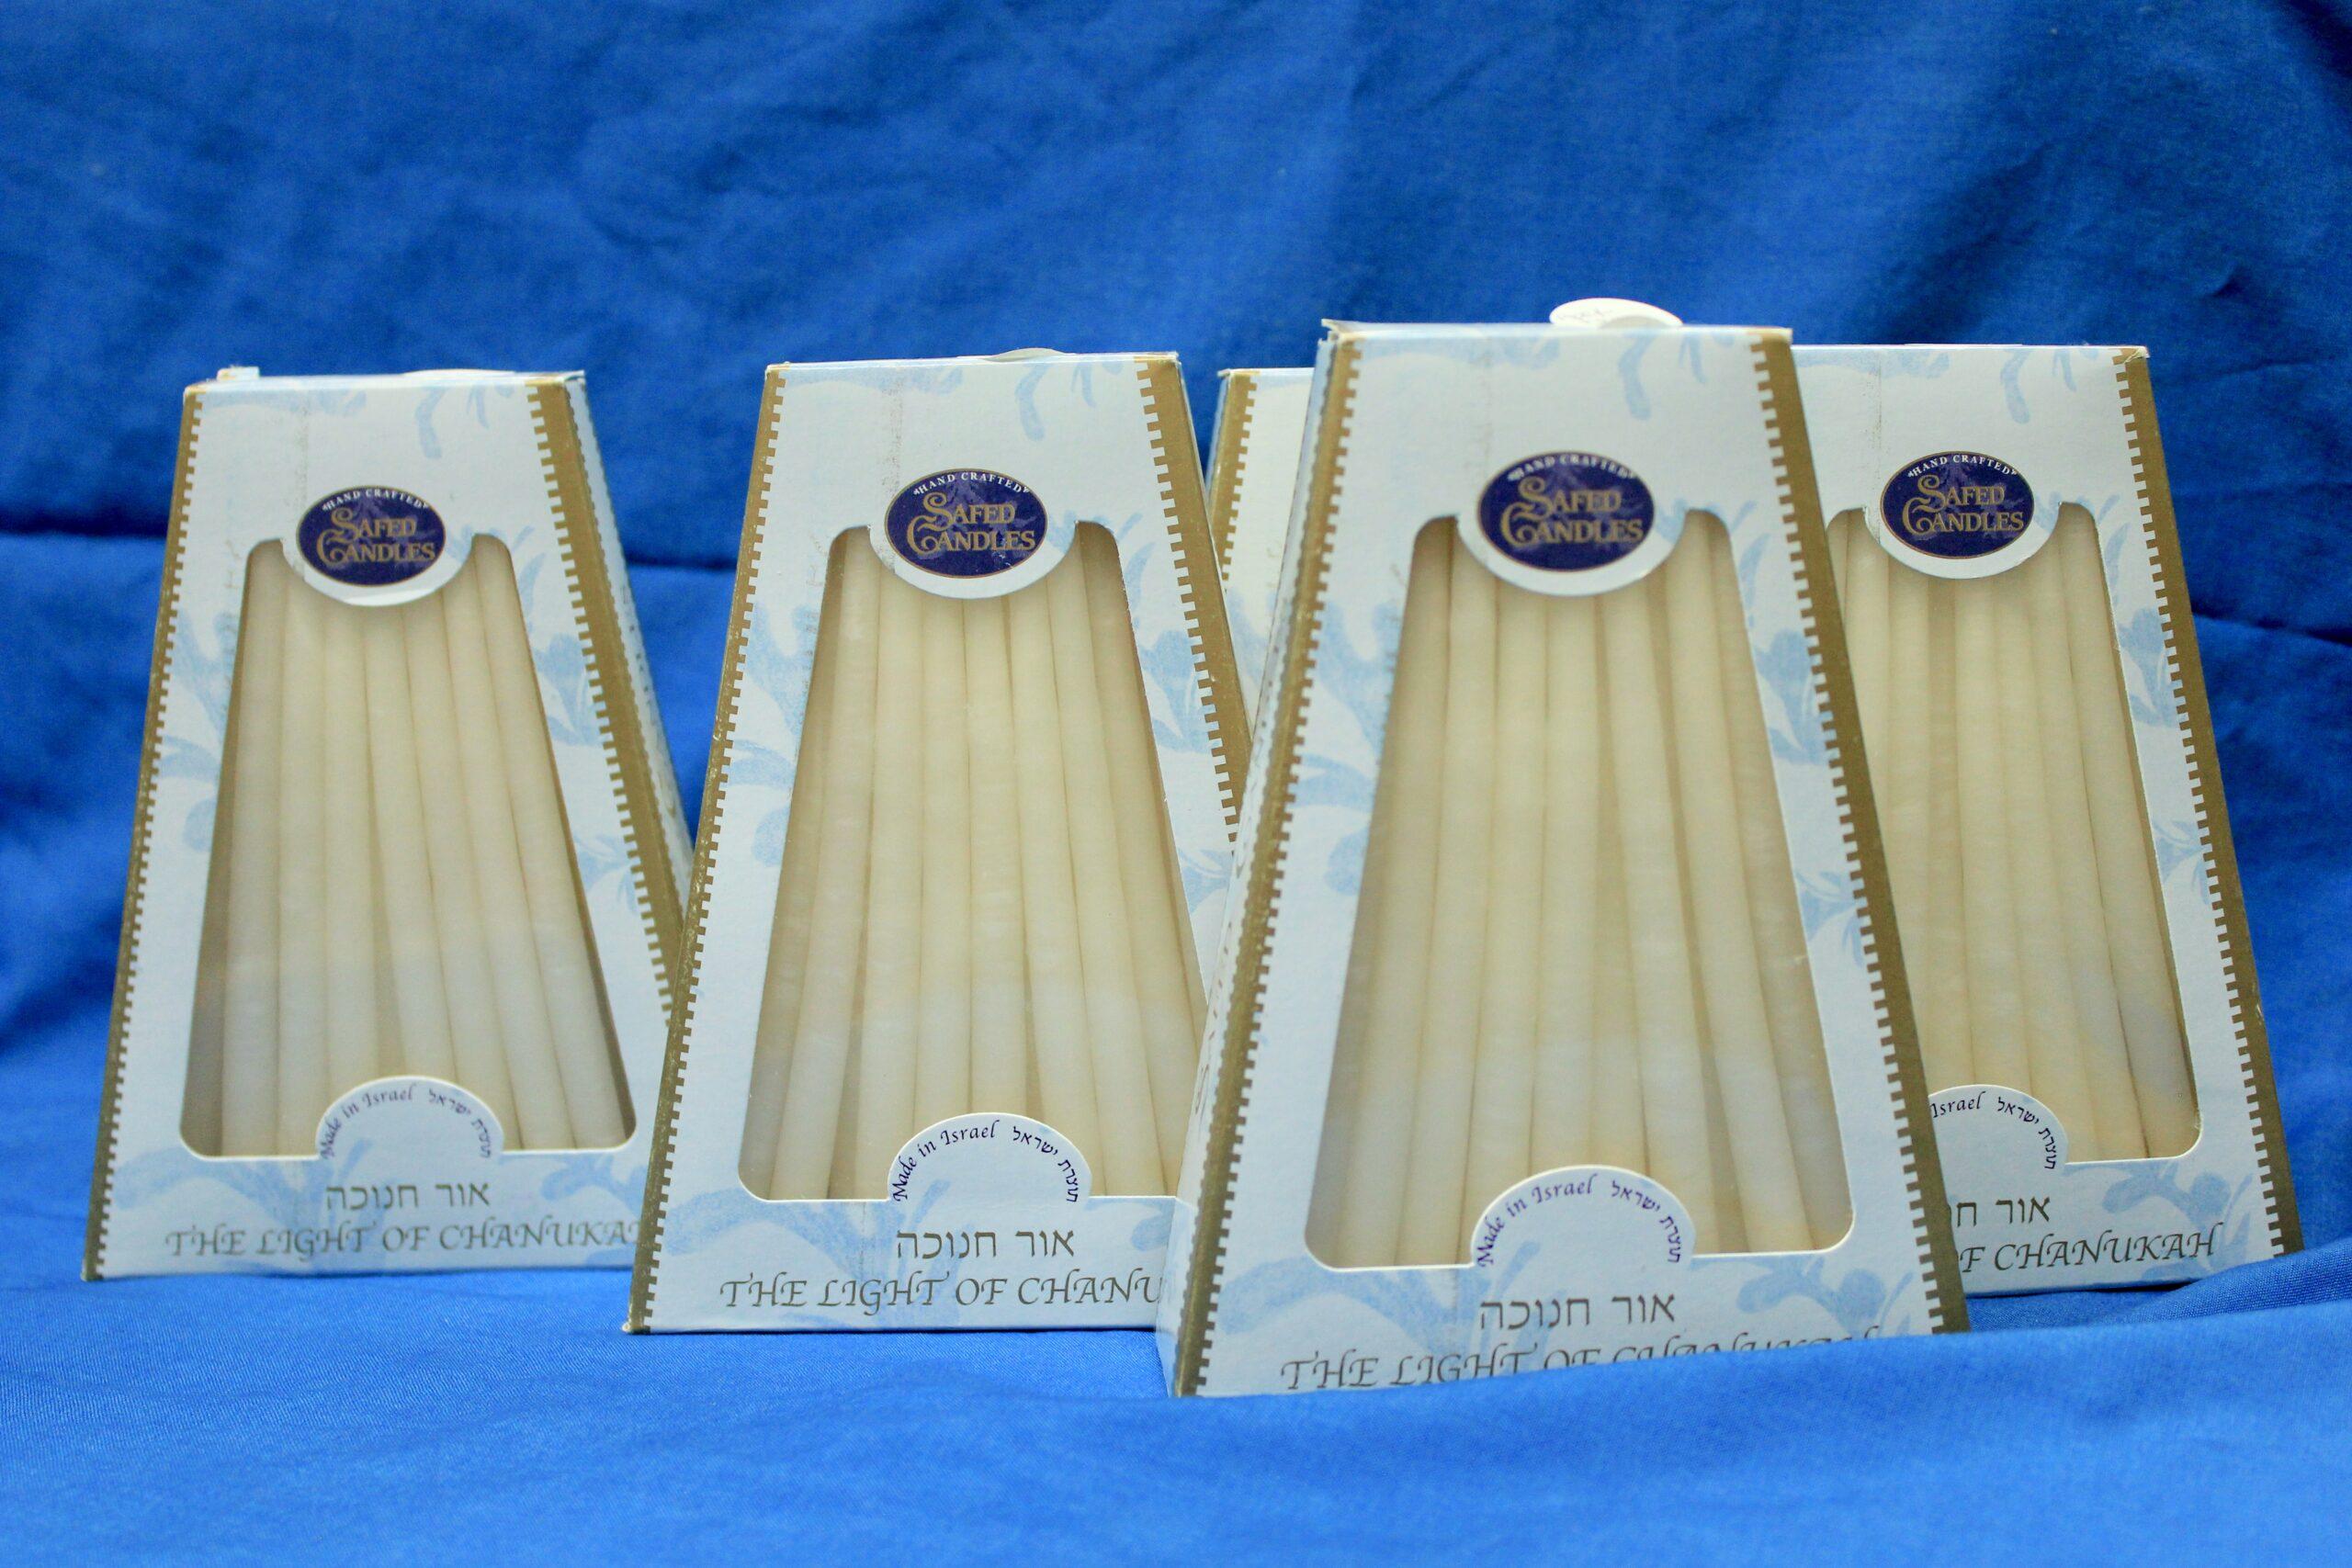 Hanukkah Candles $8.25/box (2 available)